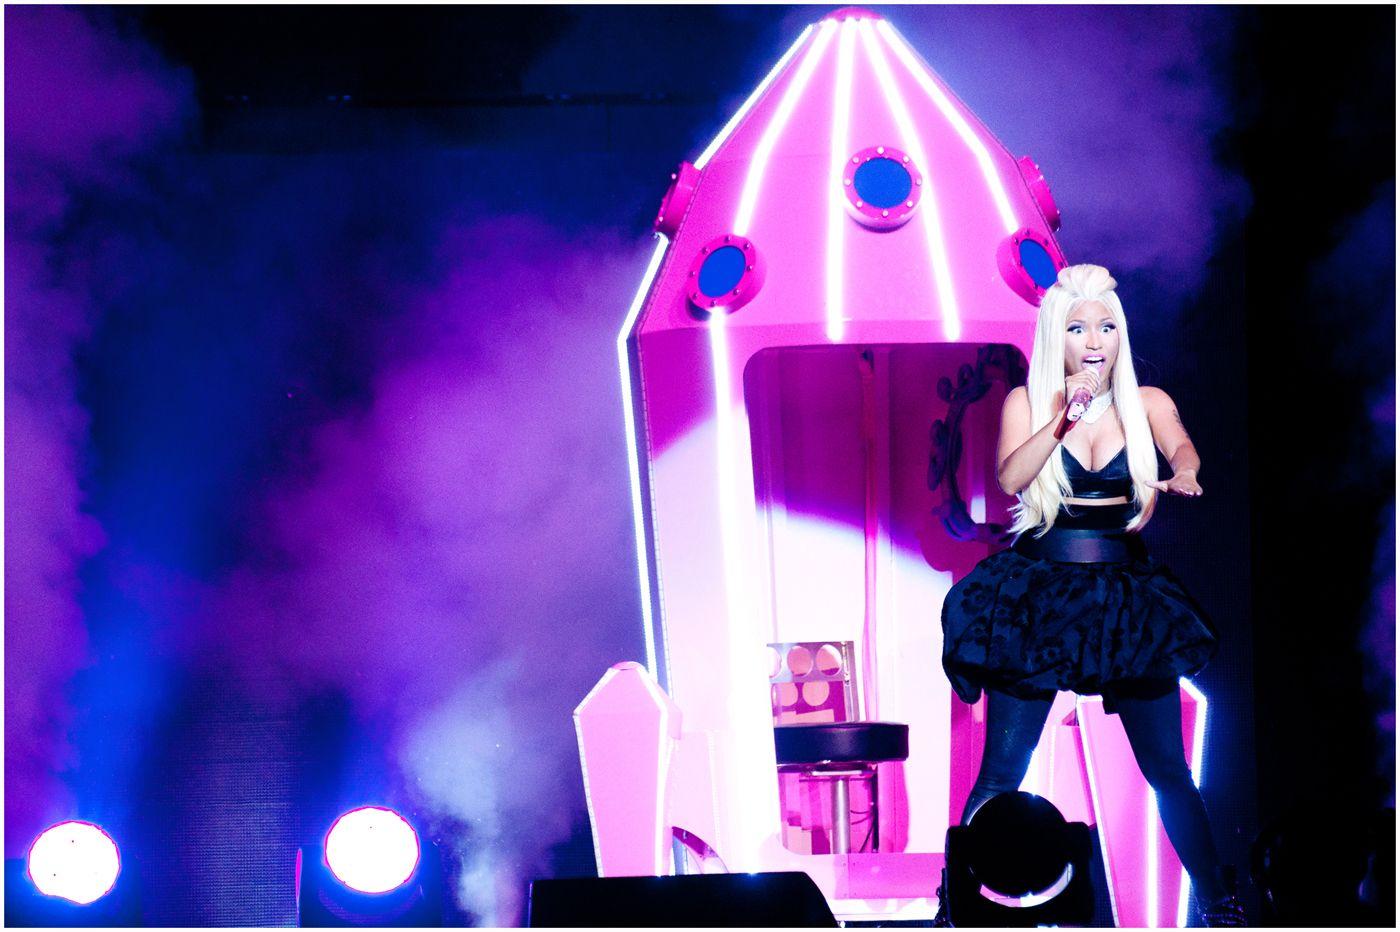 Nicki minaj the o2 arena london 2015